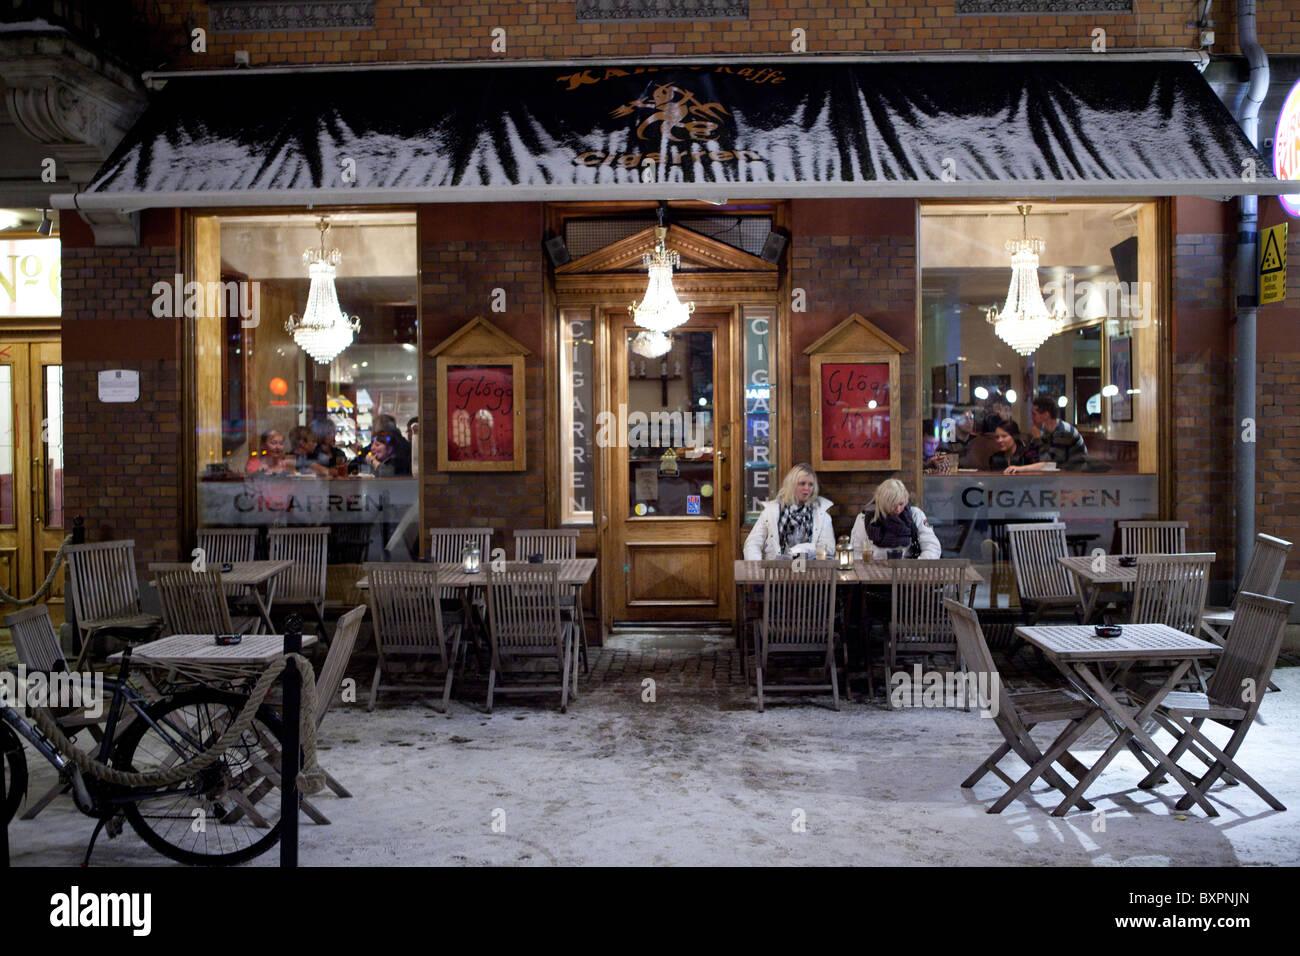 Coffeehouses of Gothenburg, Sweden - Stock Image